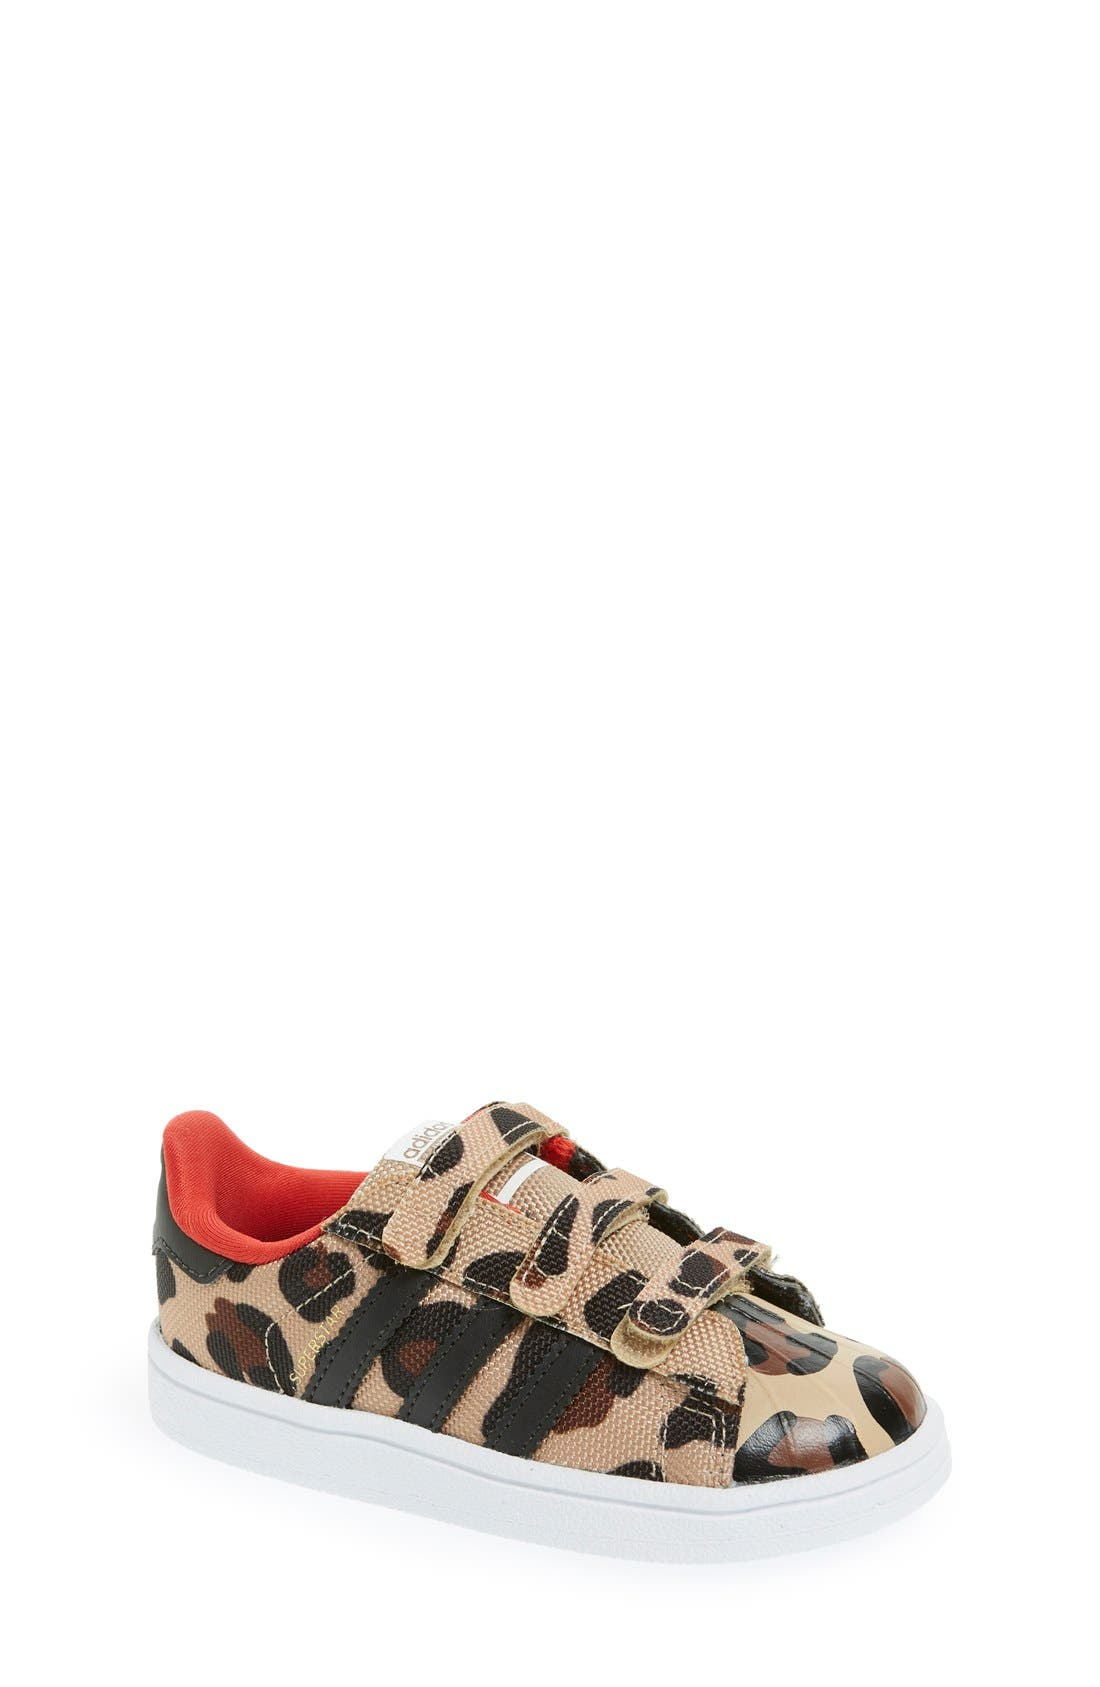 adidas 'Superstar - Leopard' Sneaker